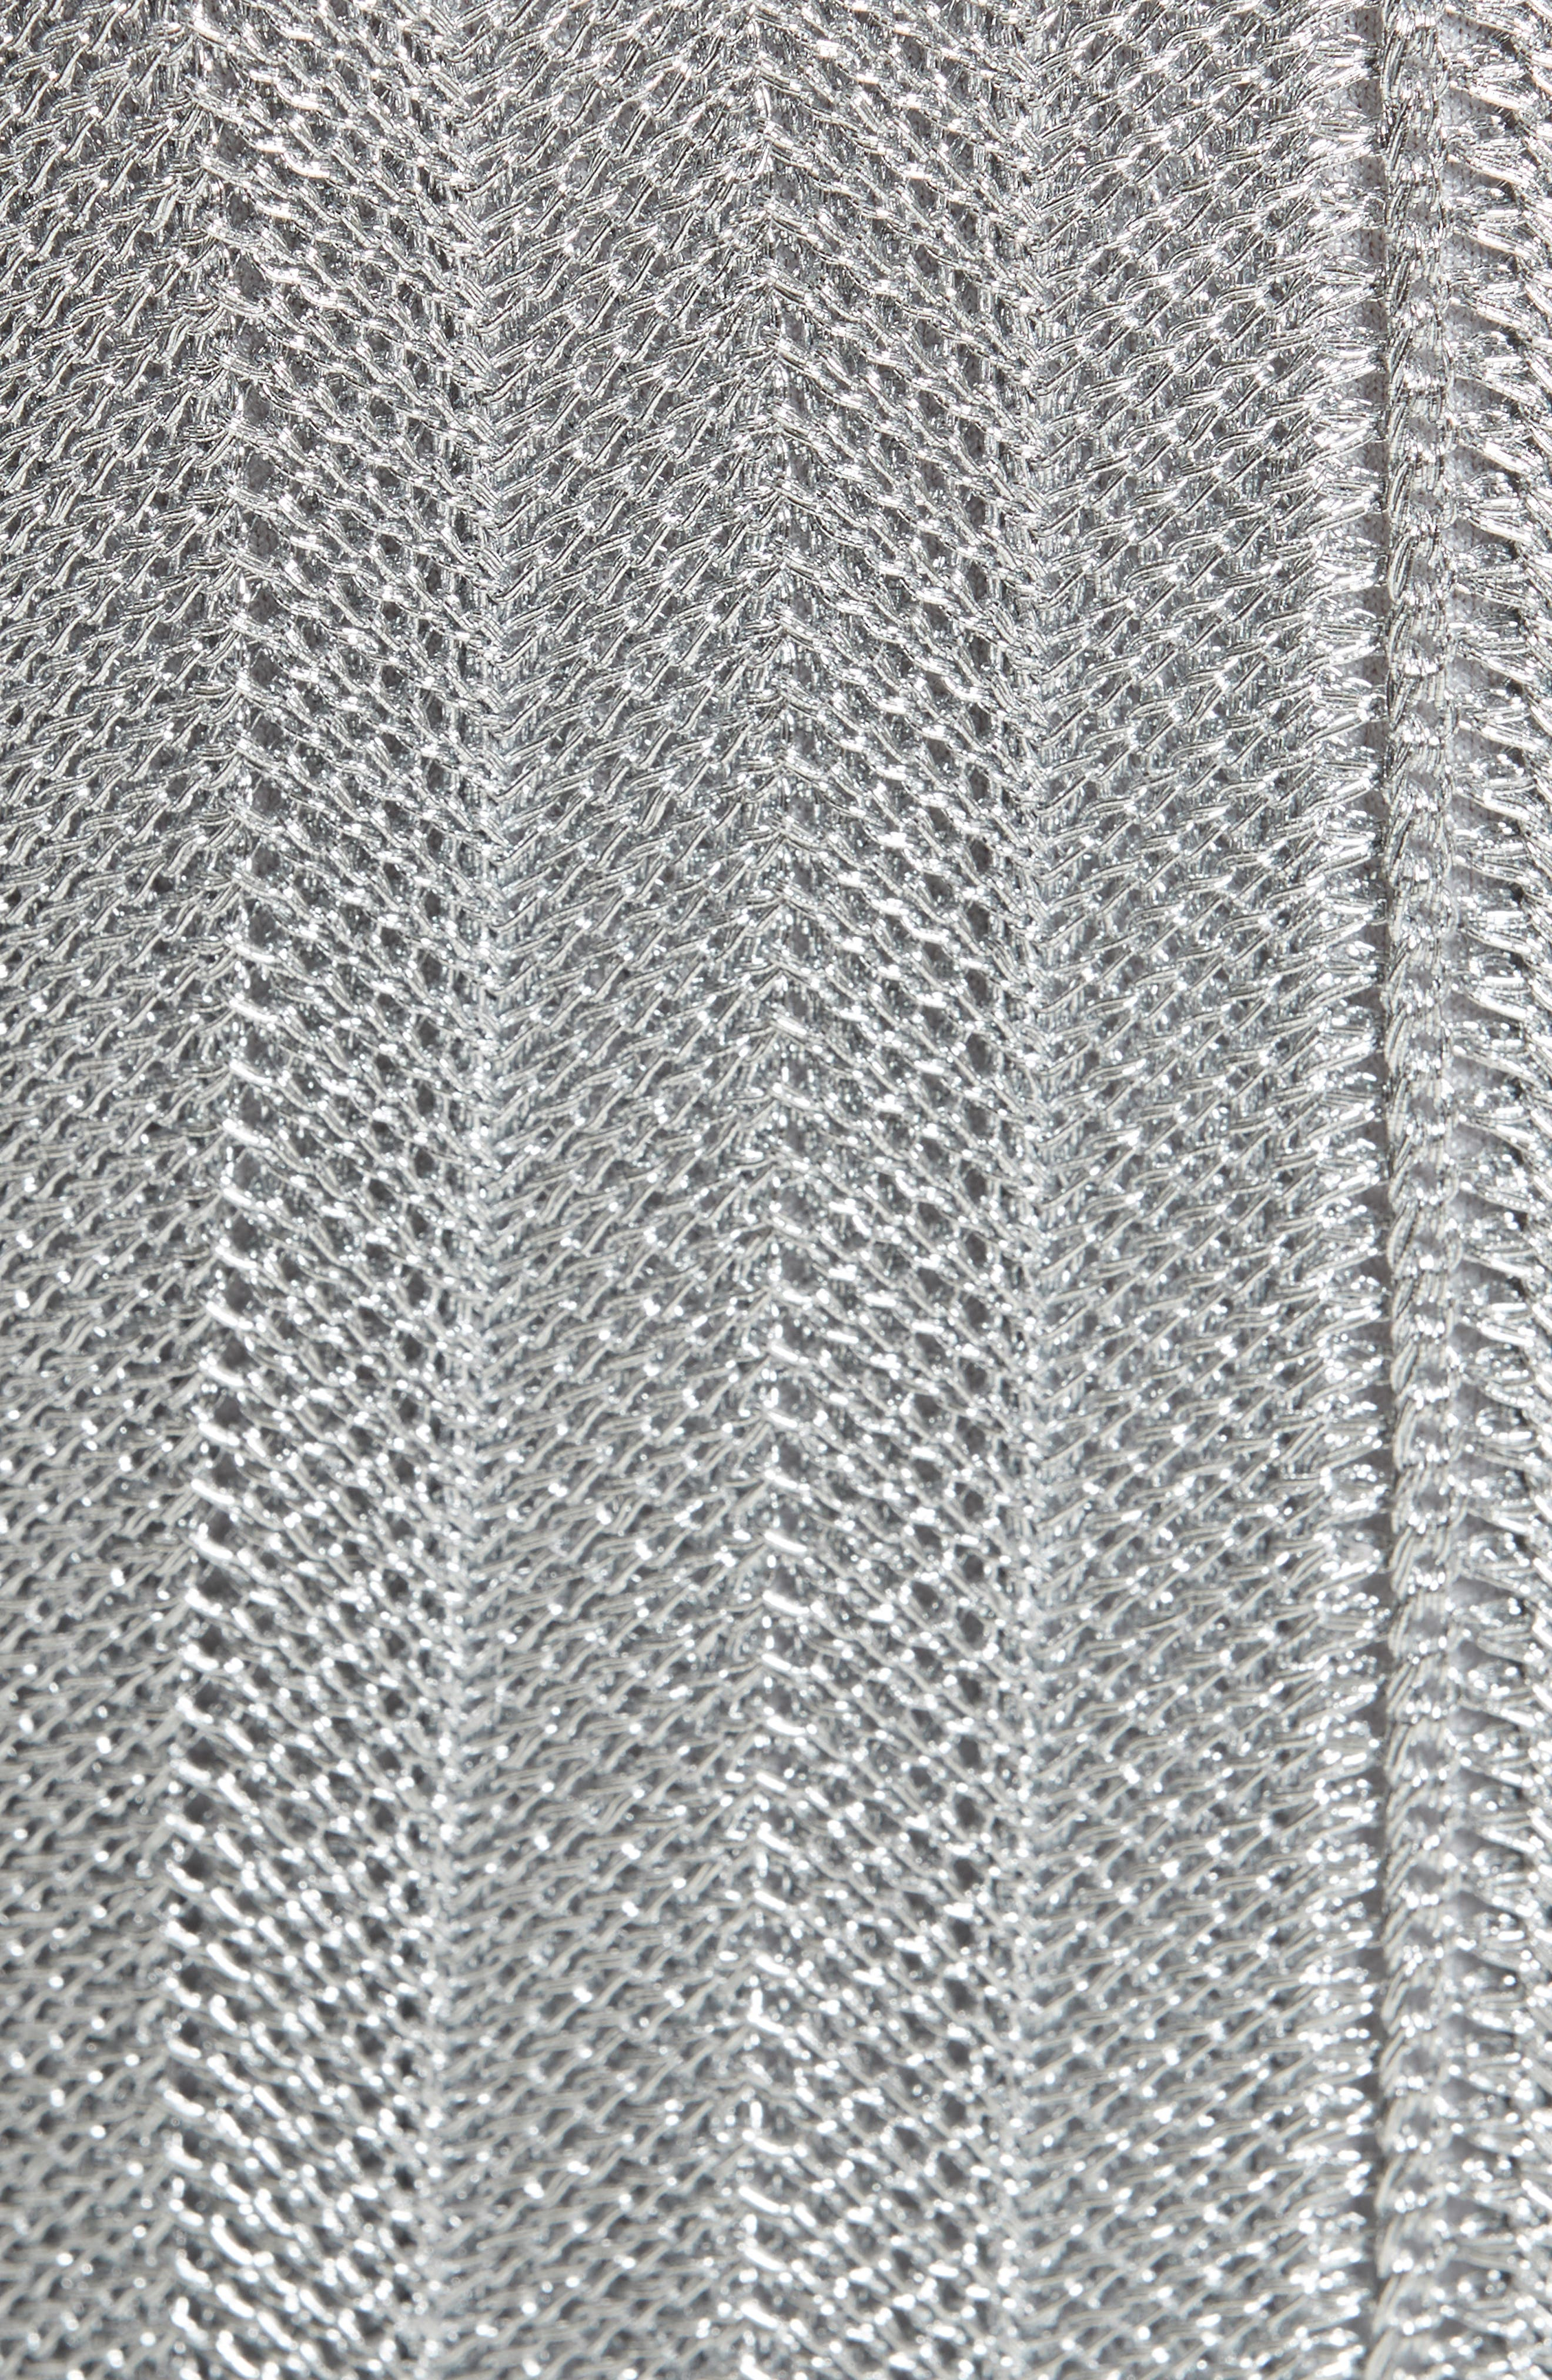 Metallic Knit Fit & Flare Dress,                             Alternate thumbnail 5, color,                             040